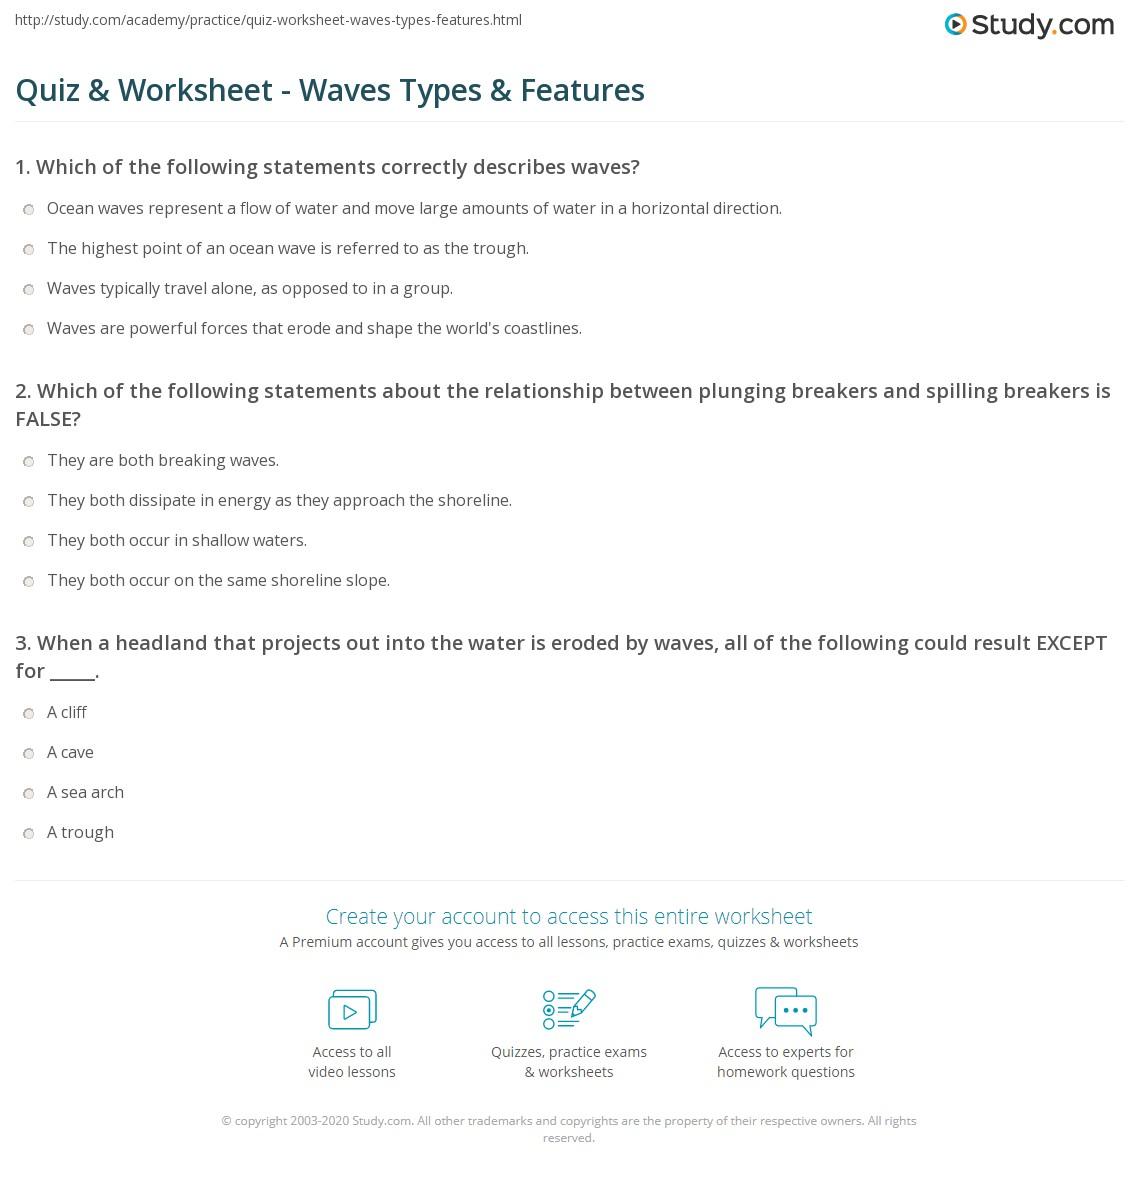 quiz worksheet waves types features. Black Bedroom Furniture Sets. Home Design Ideas